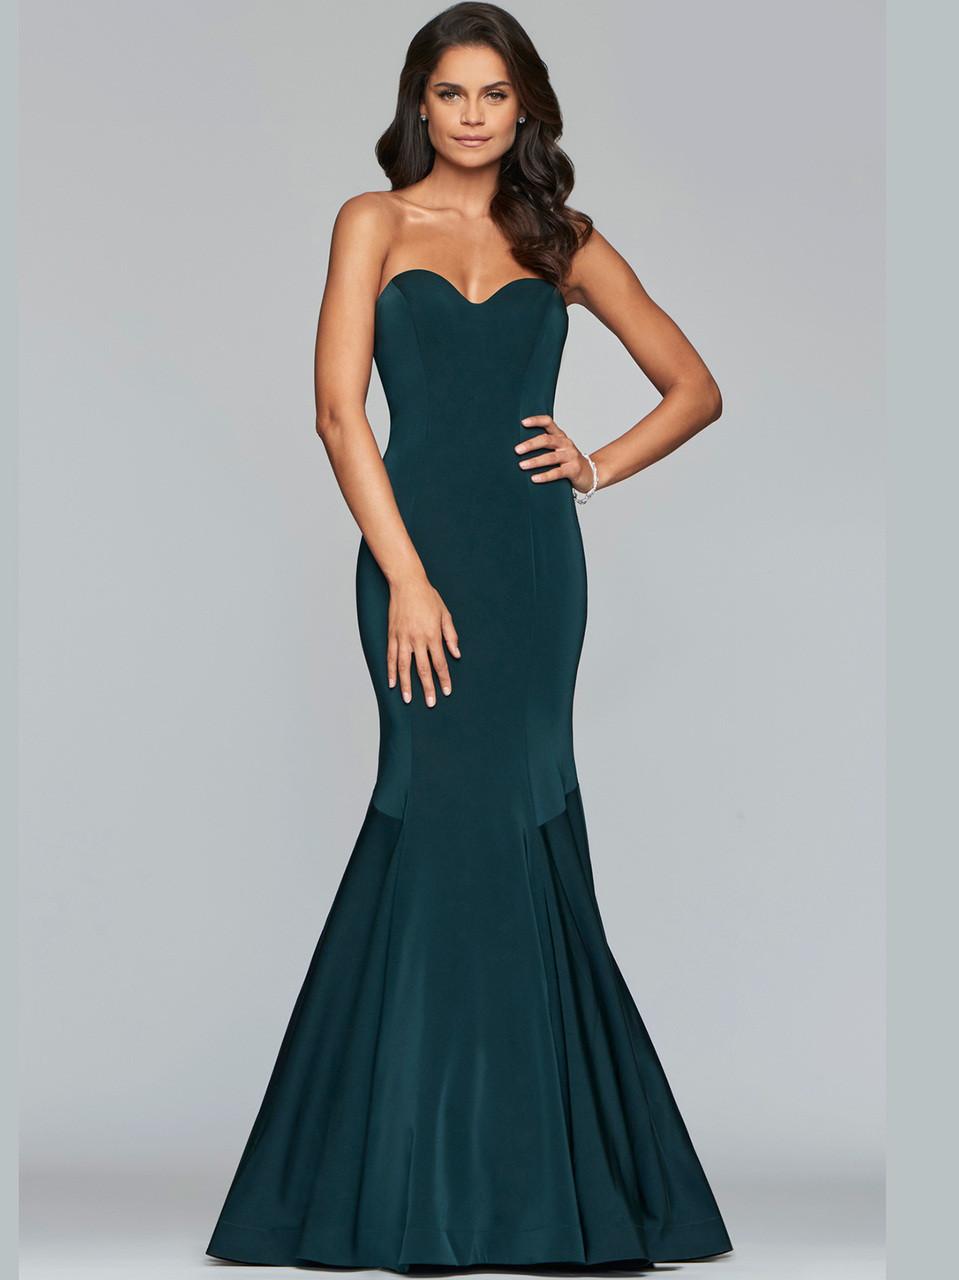 9b3e289983d Faviana Strapless Mermaid Satin Prom Dress S10213